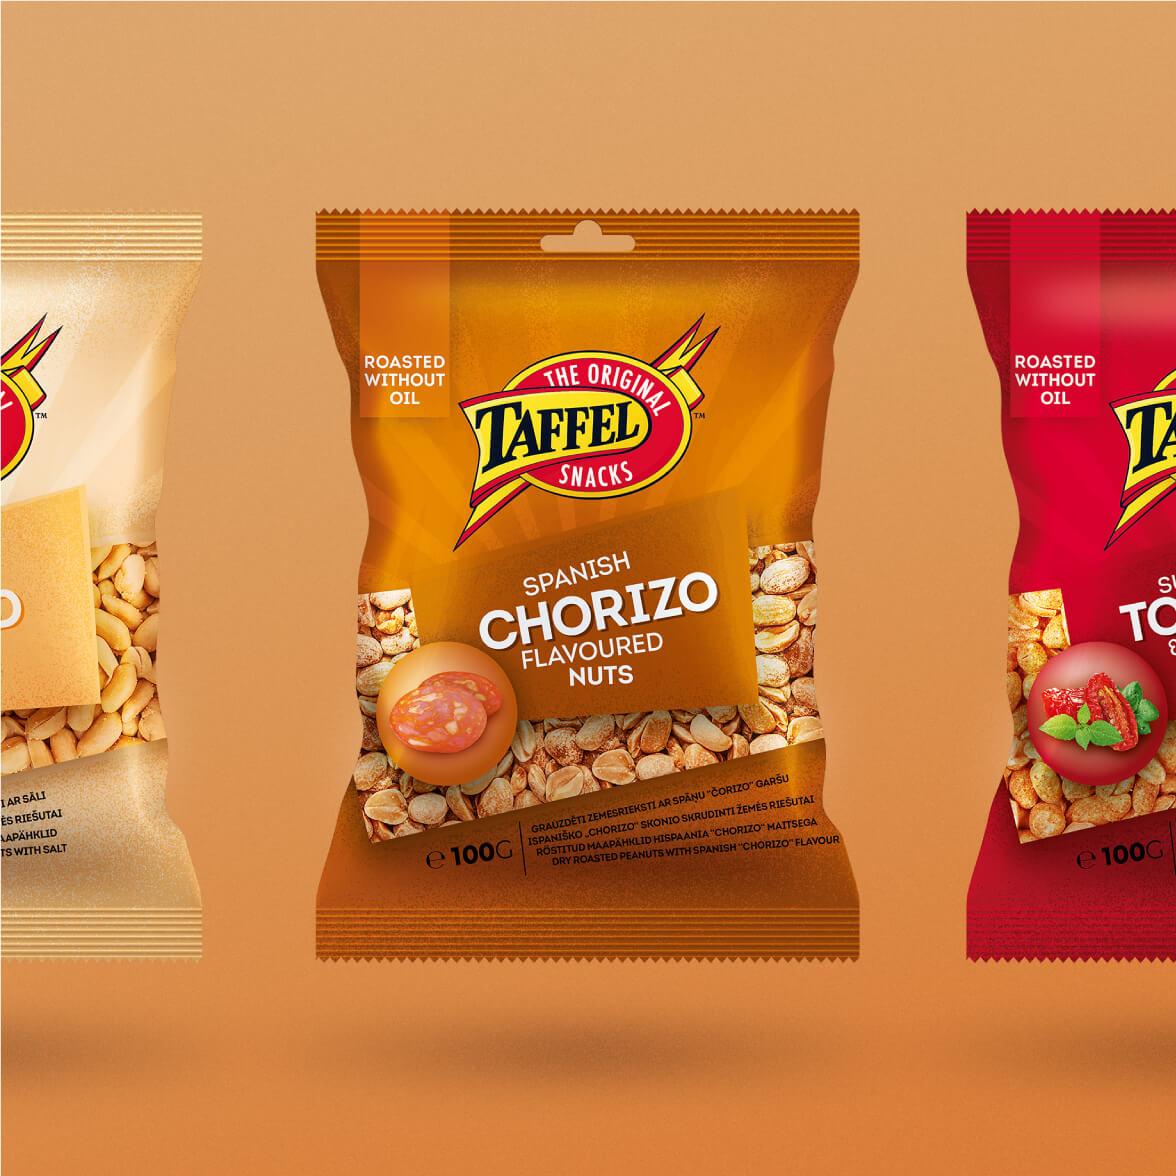 Taffel Nuts - packaging redesign